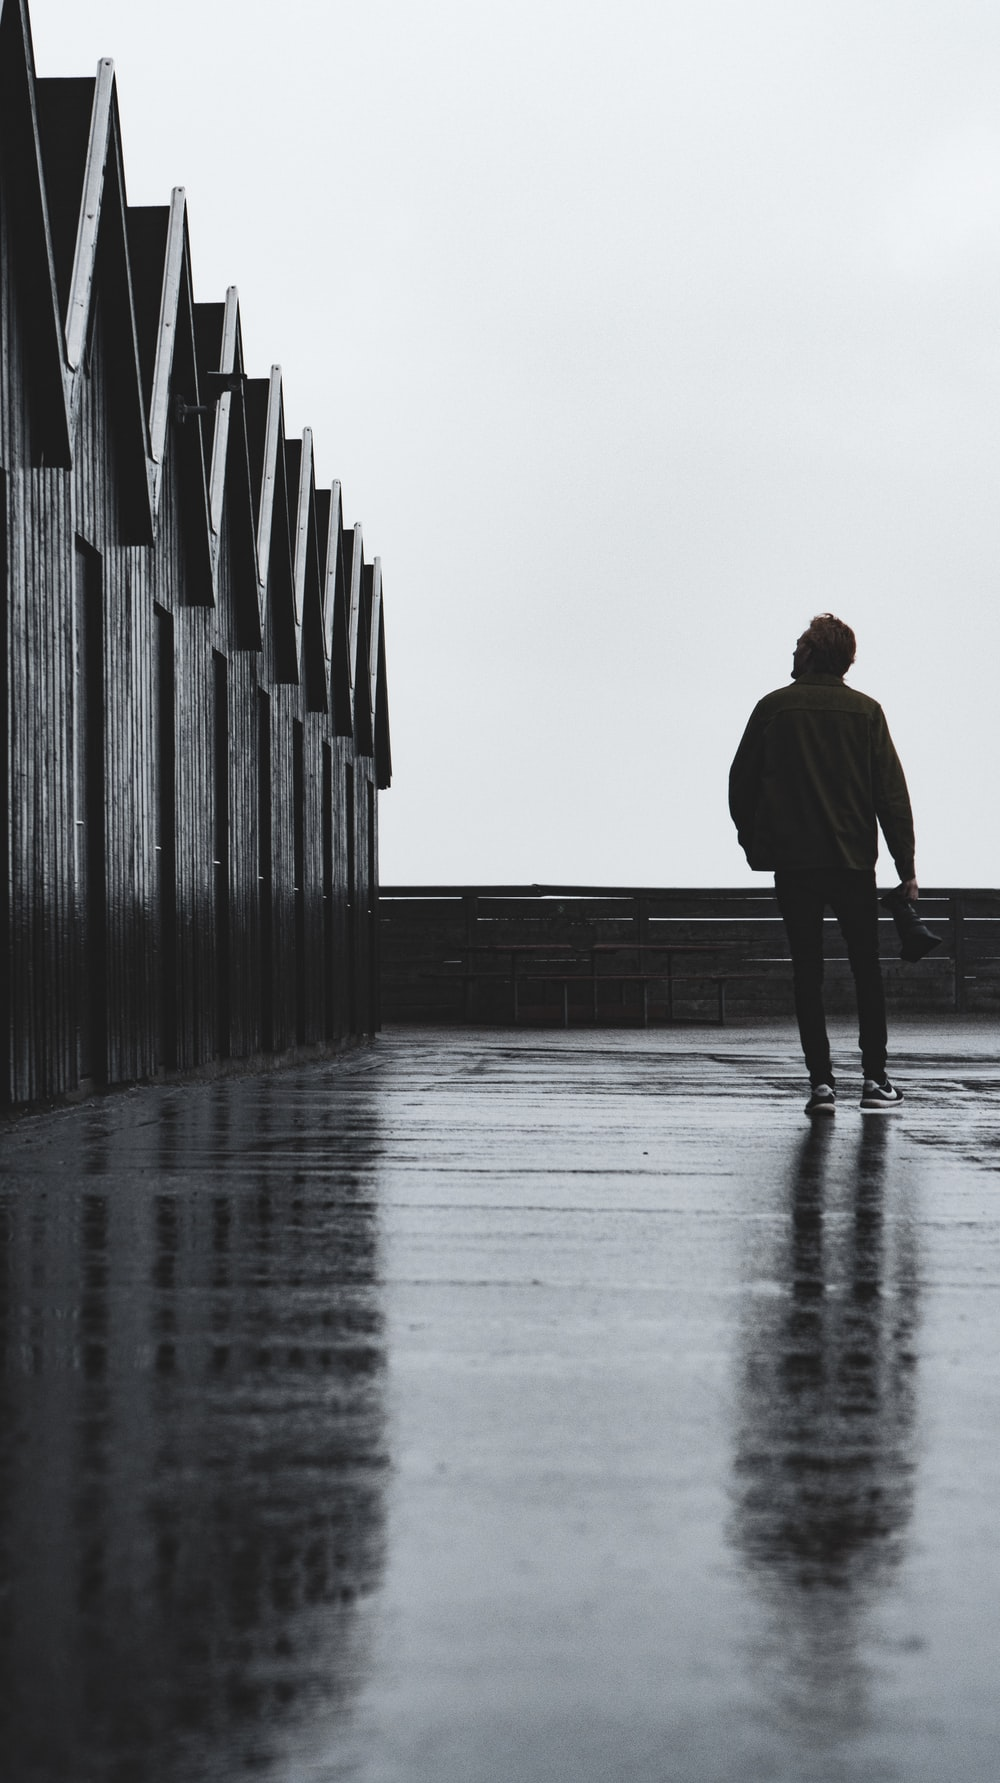 man in black coat walking on gray concrete stairs